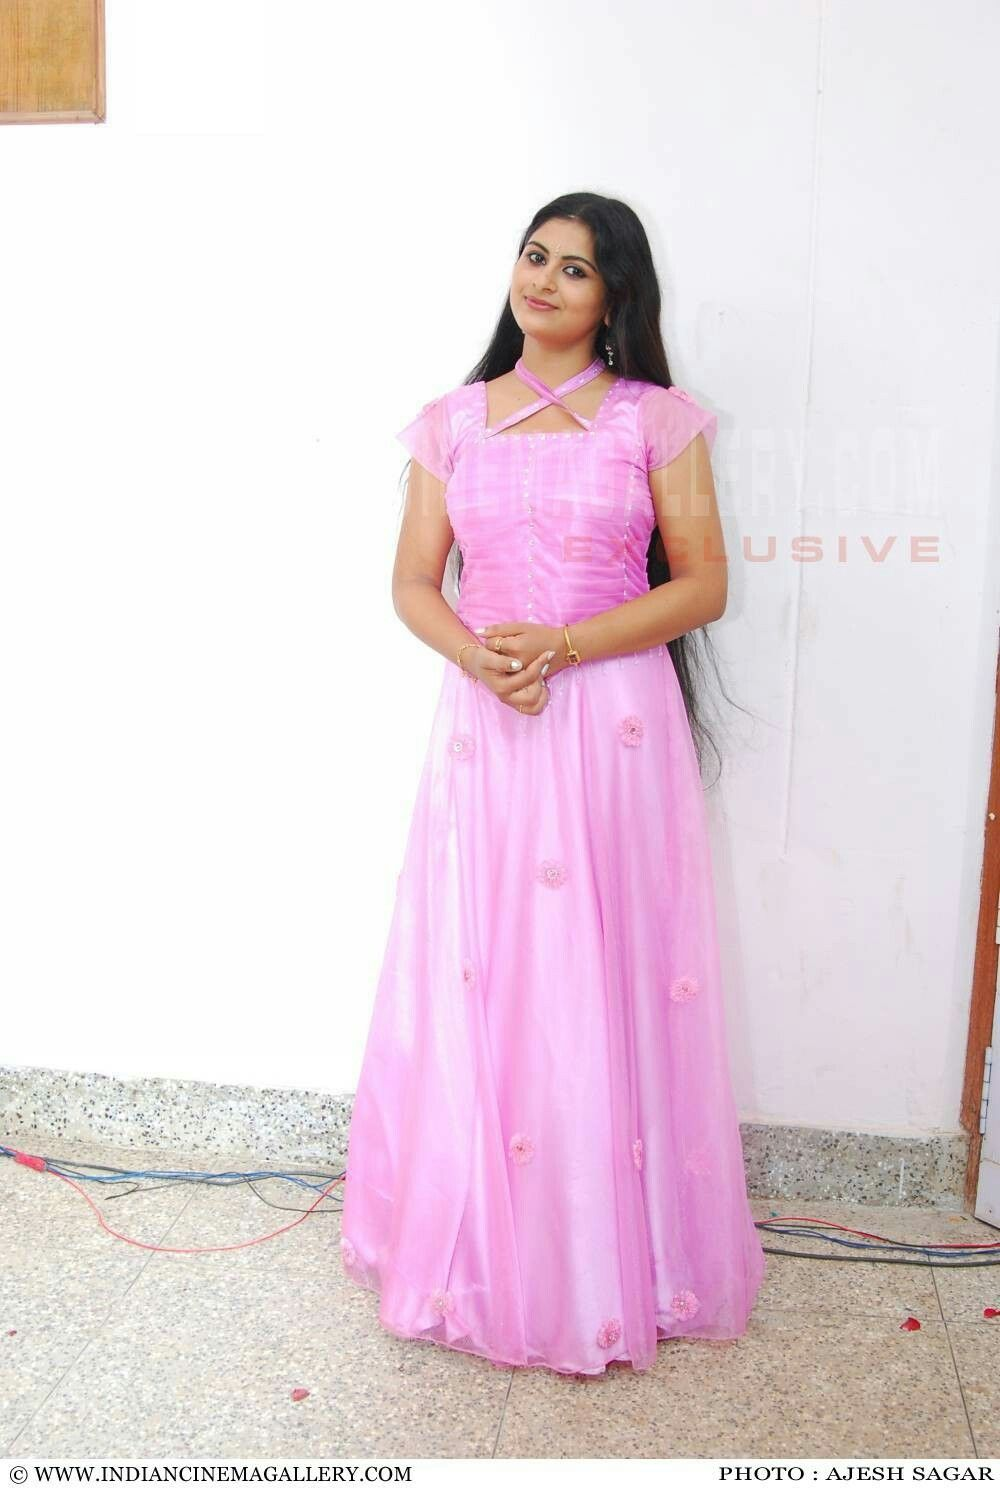 Bonito Vestido De La Unión Kareena Kapoor Ideas Ornamento ...